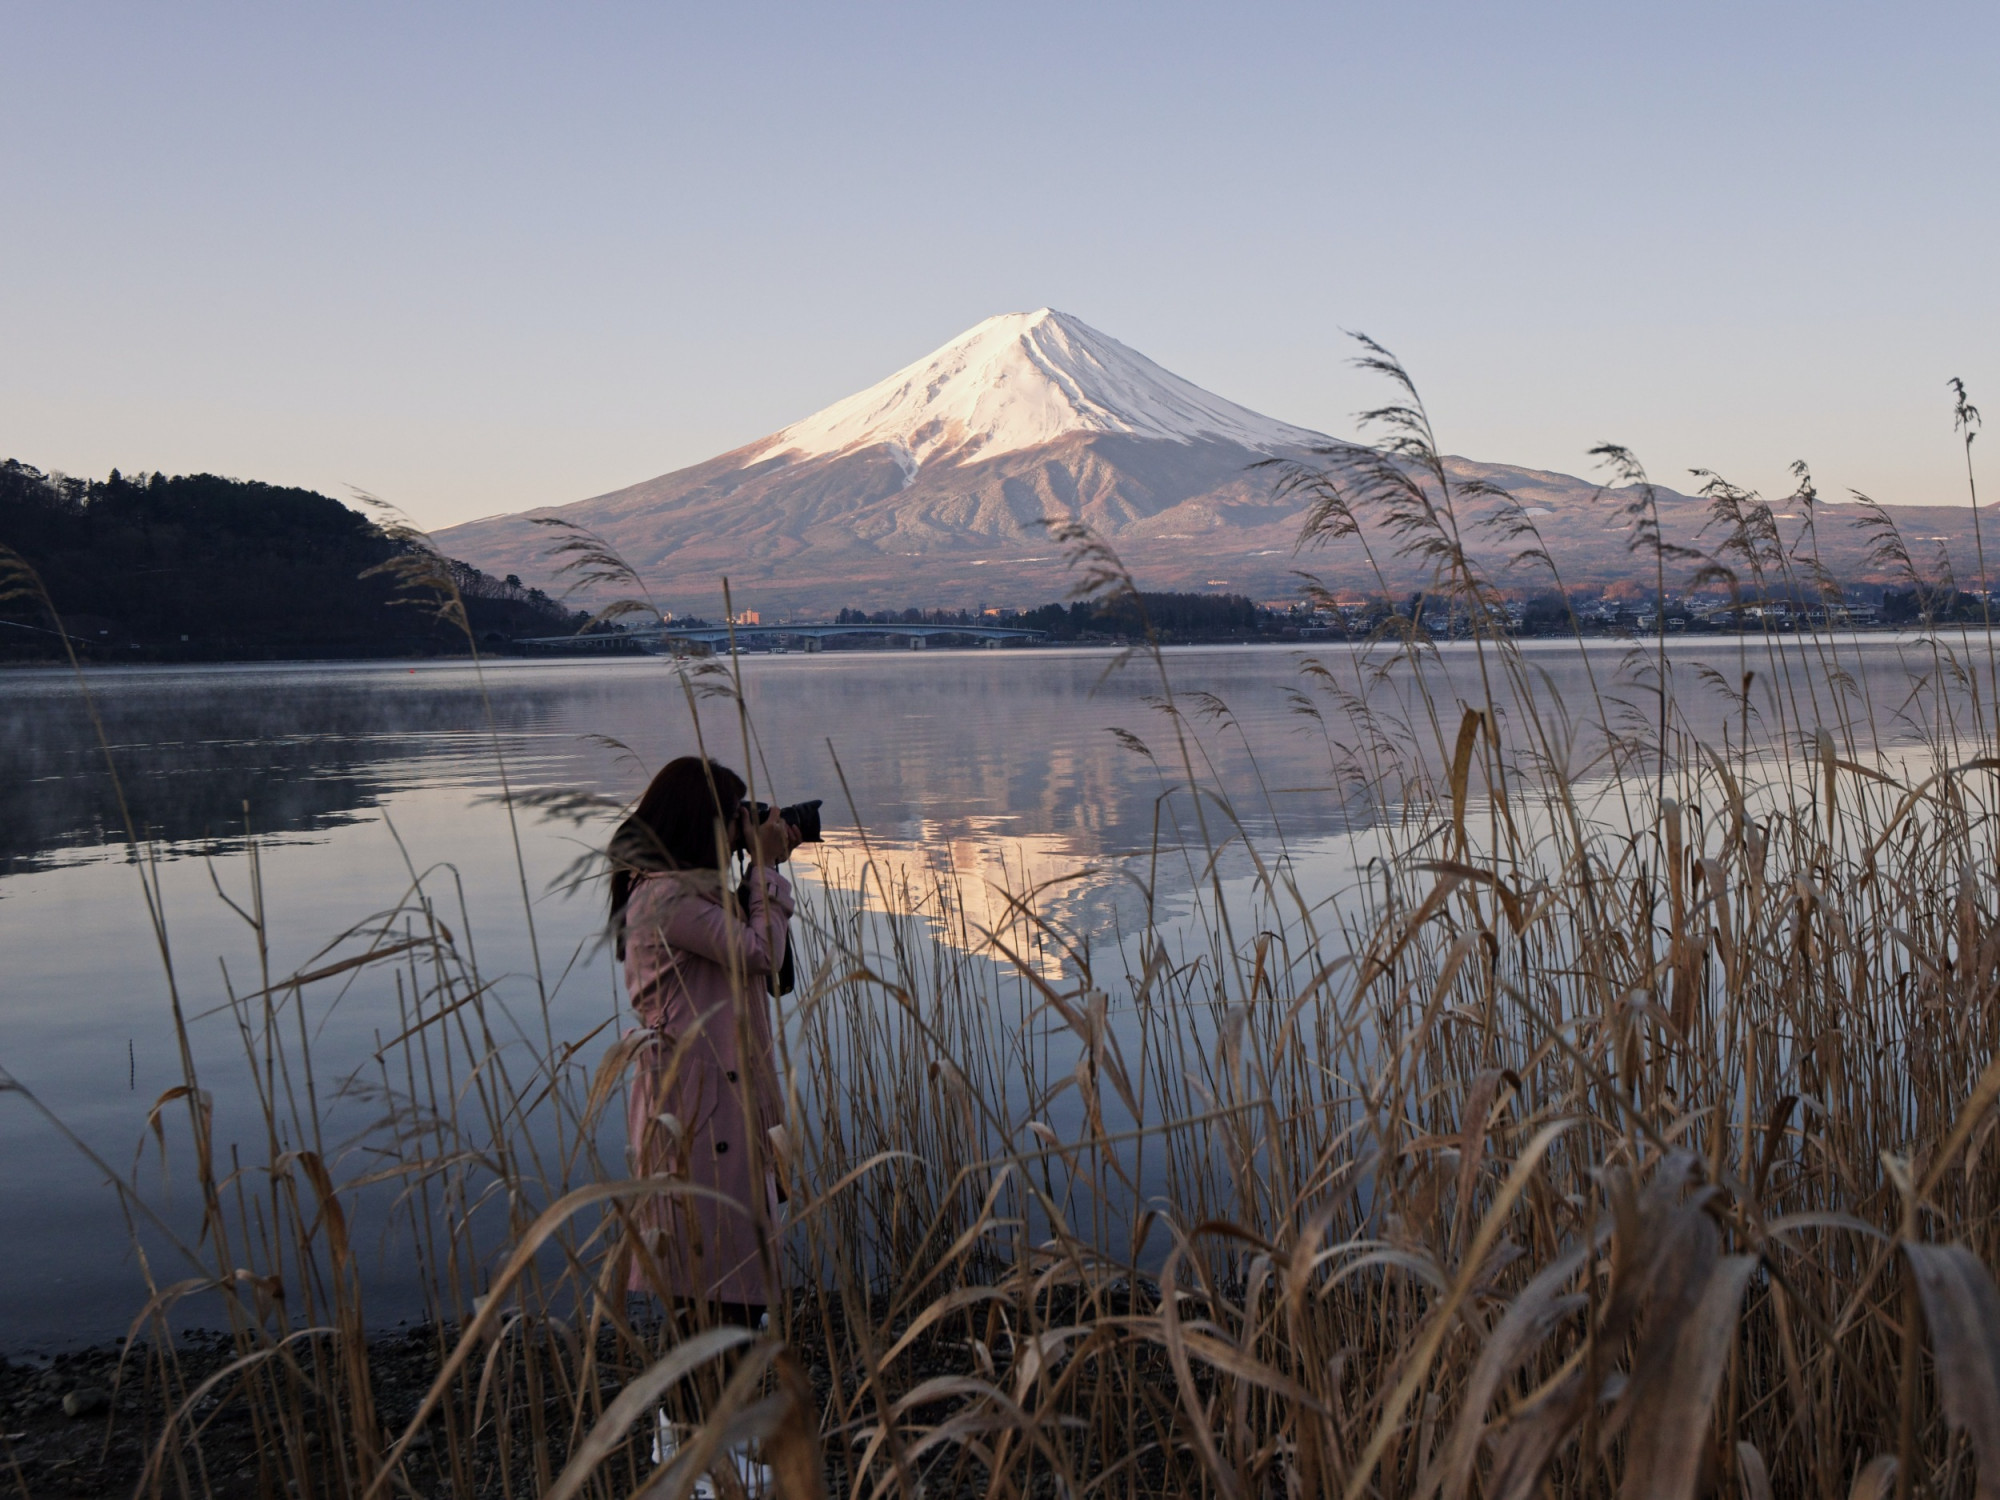 Woman photographing mount fuji